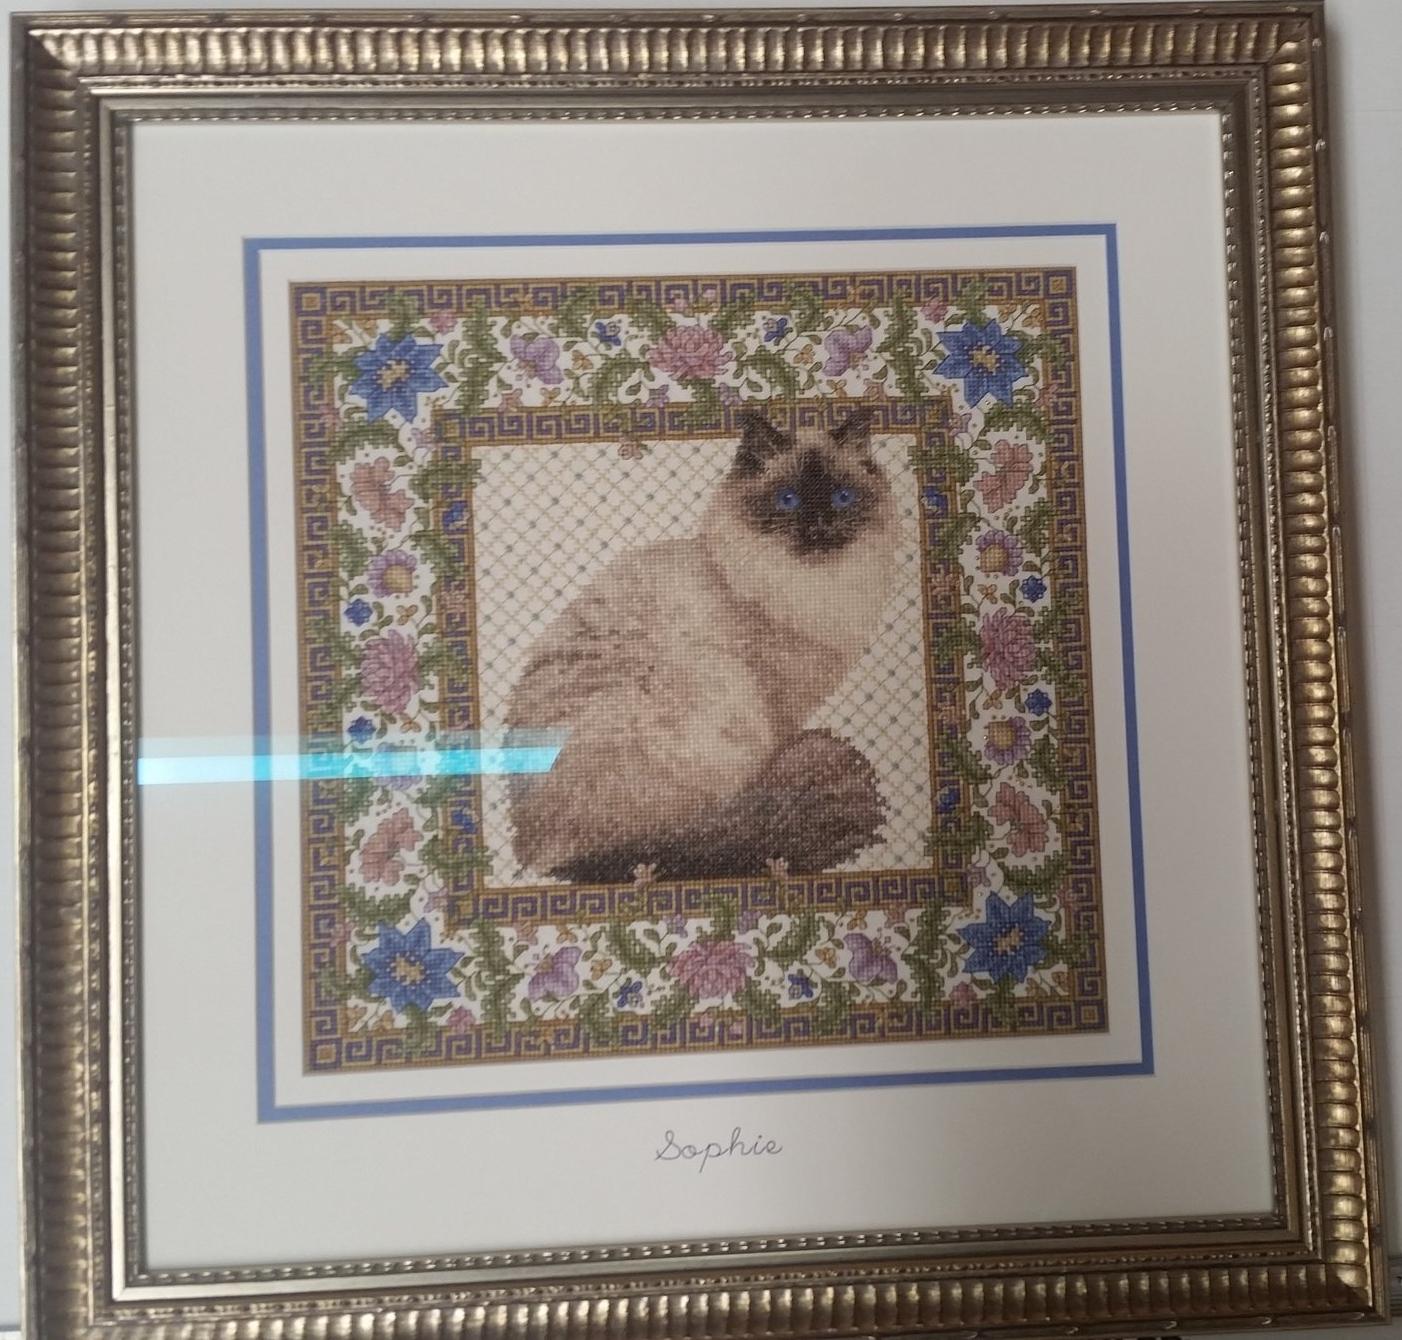 Sophie the Cat Cross-Stitch